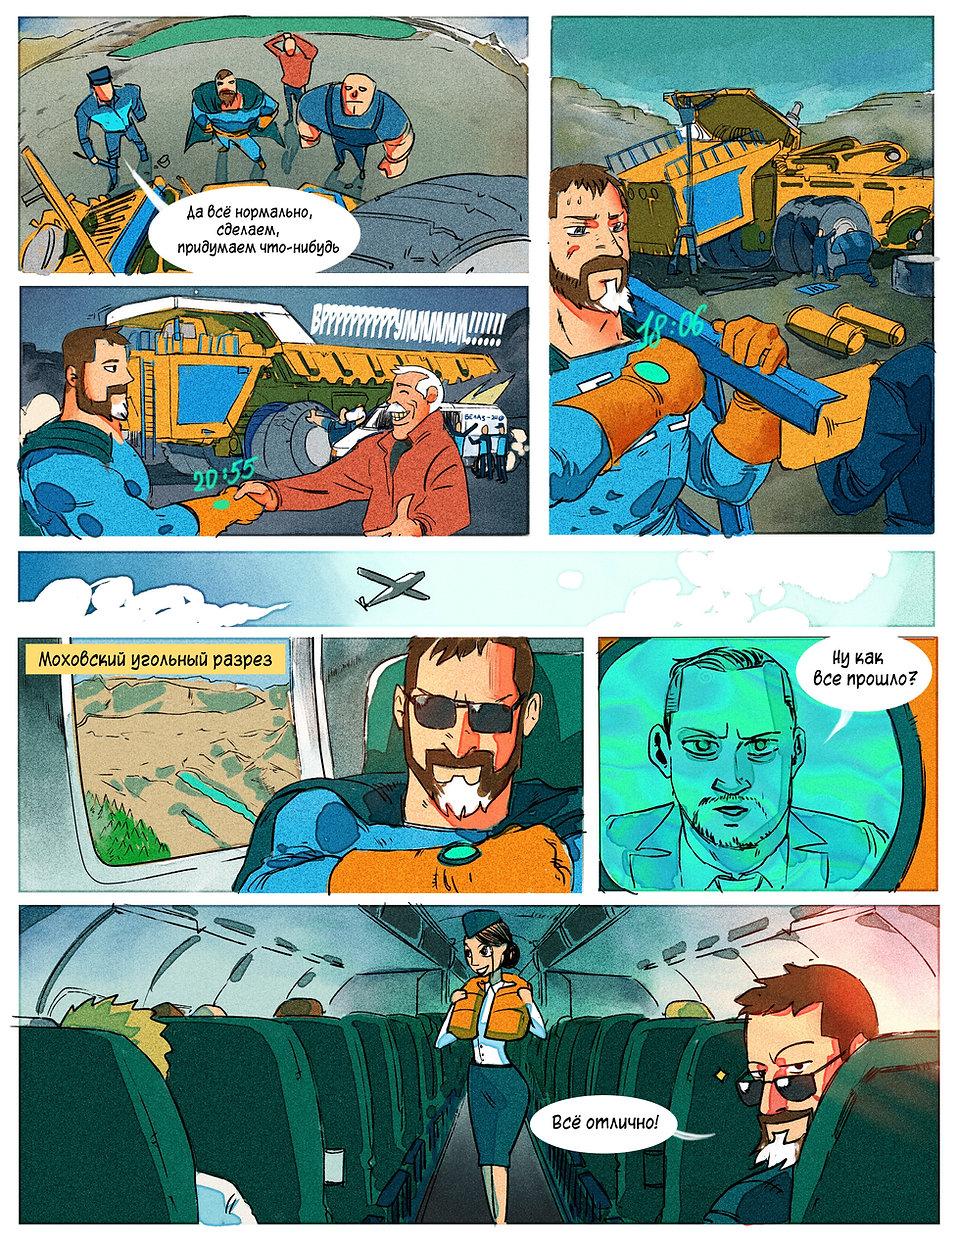 Авторский комикс коллеге на заказ. Кру. 5